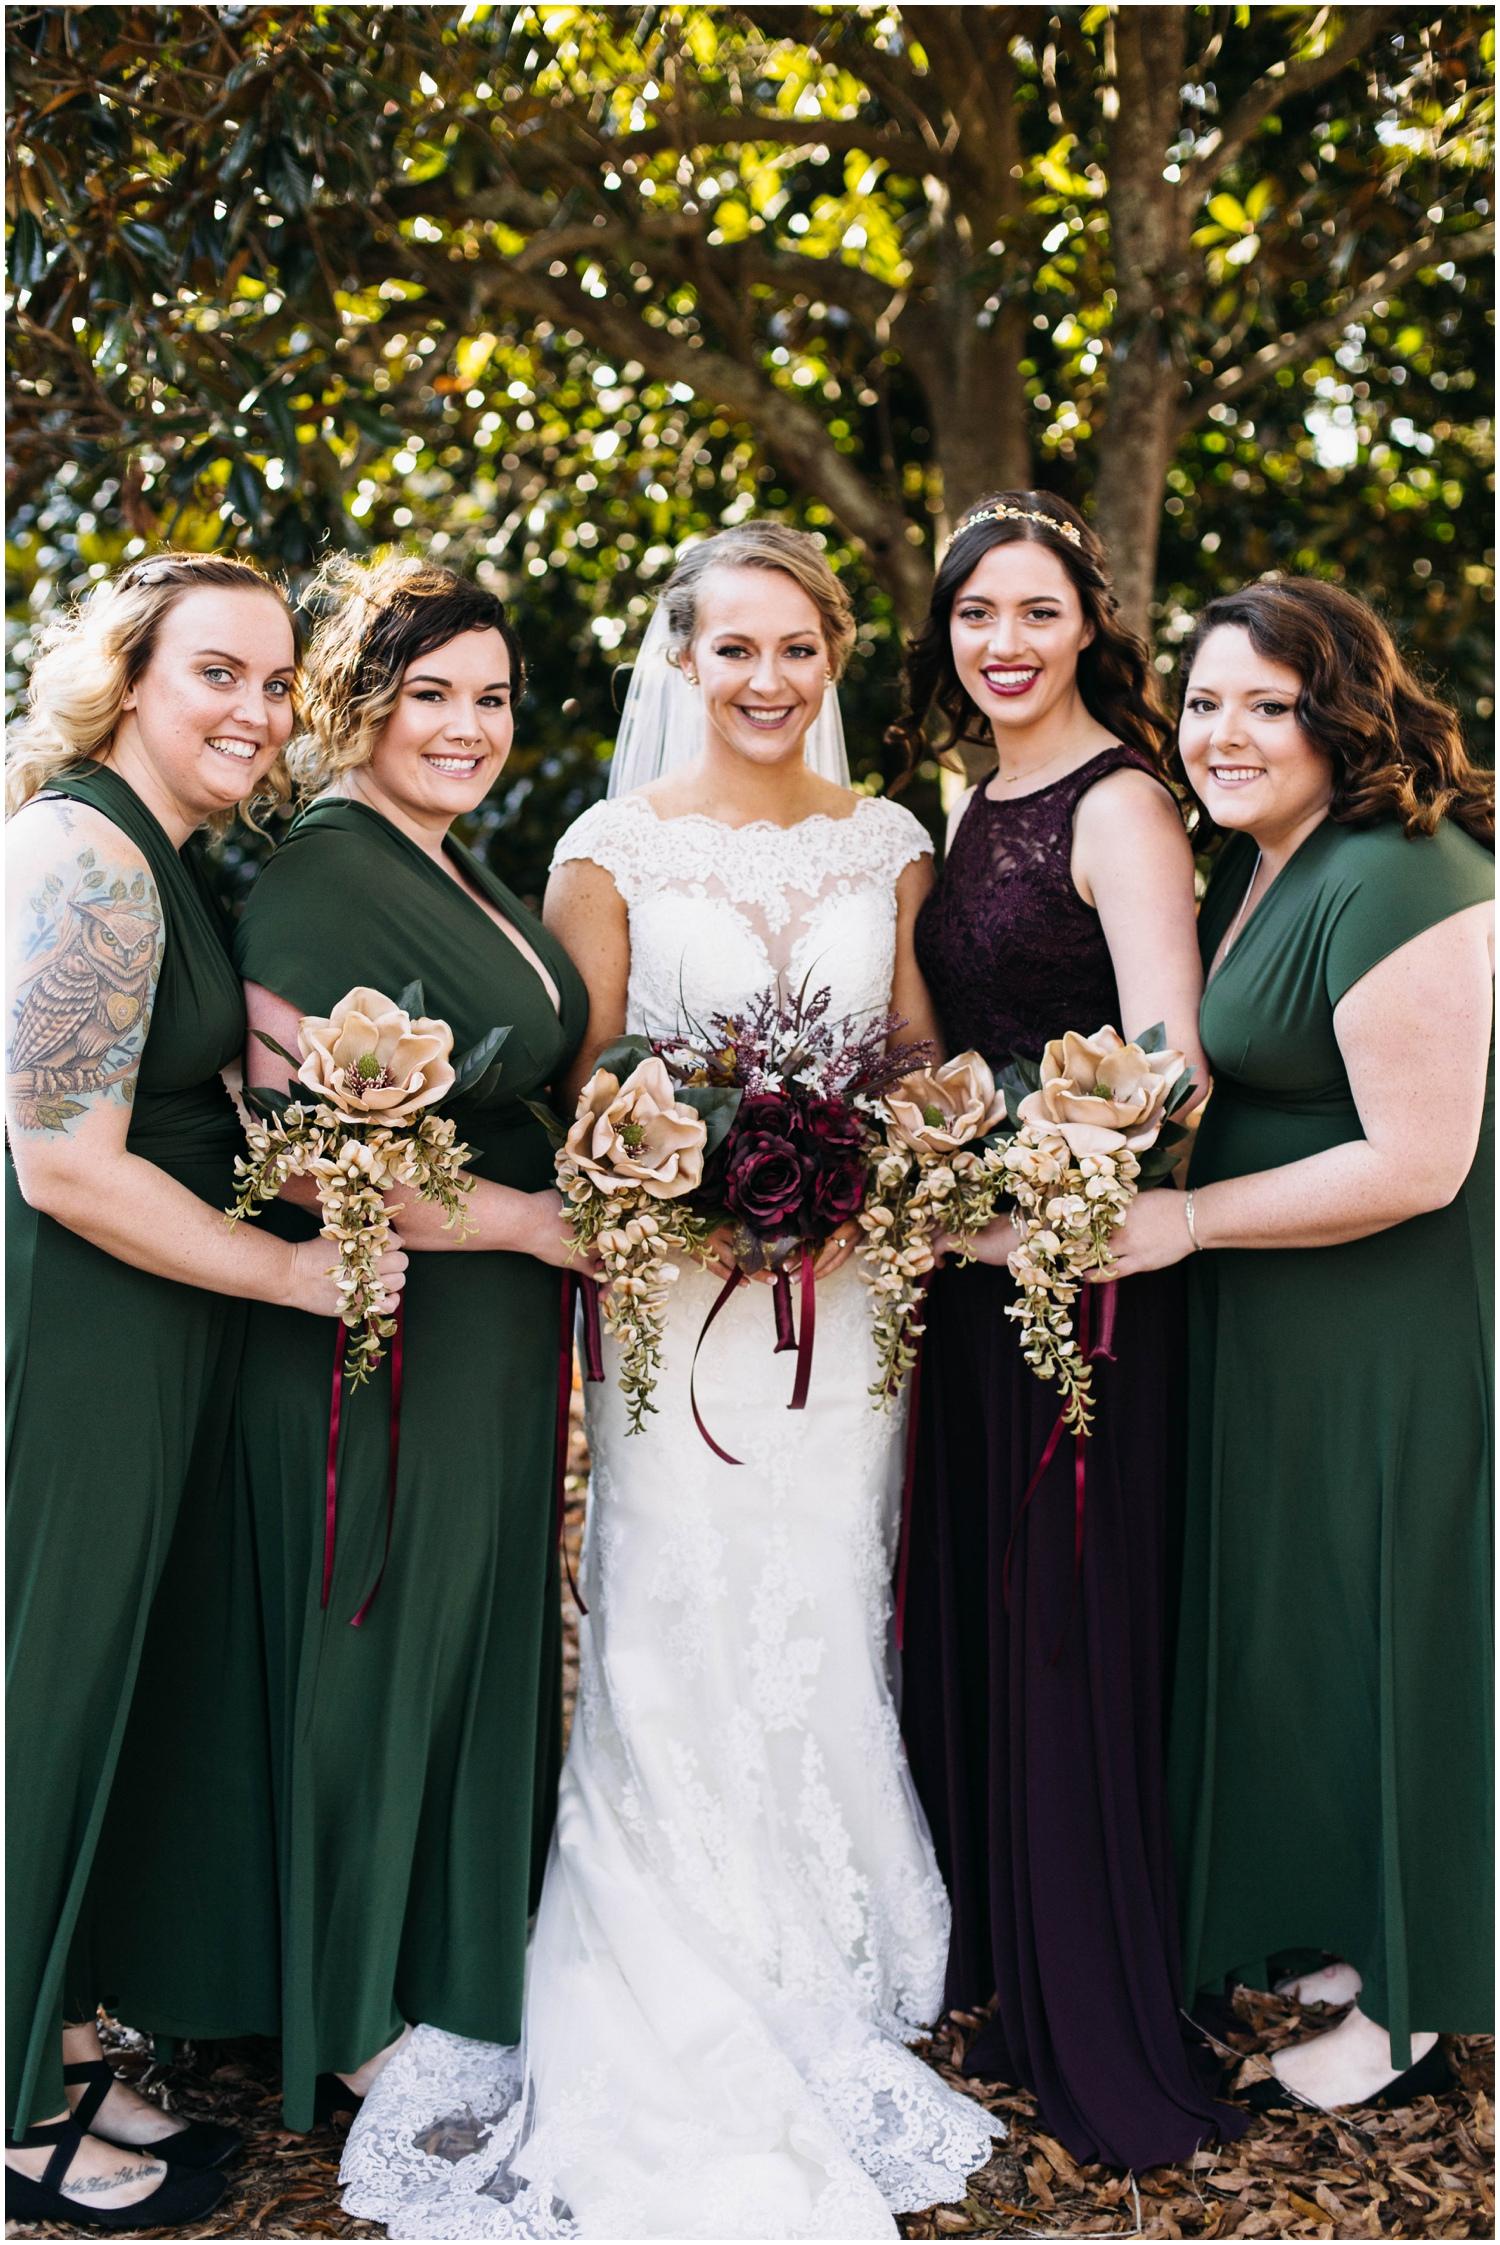 Jess+Dan_rustic_southern_farm_fall_wedding_charlotte_north carolina_taylor powers_0104.jpg